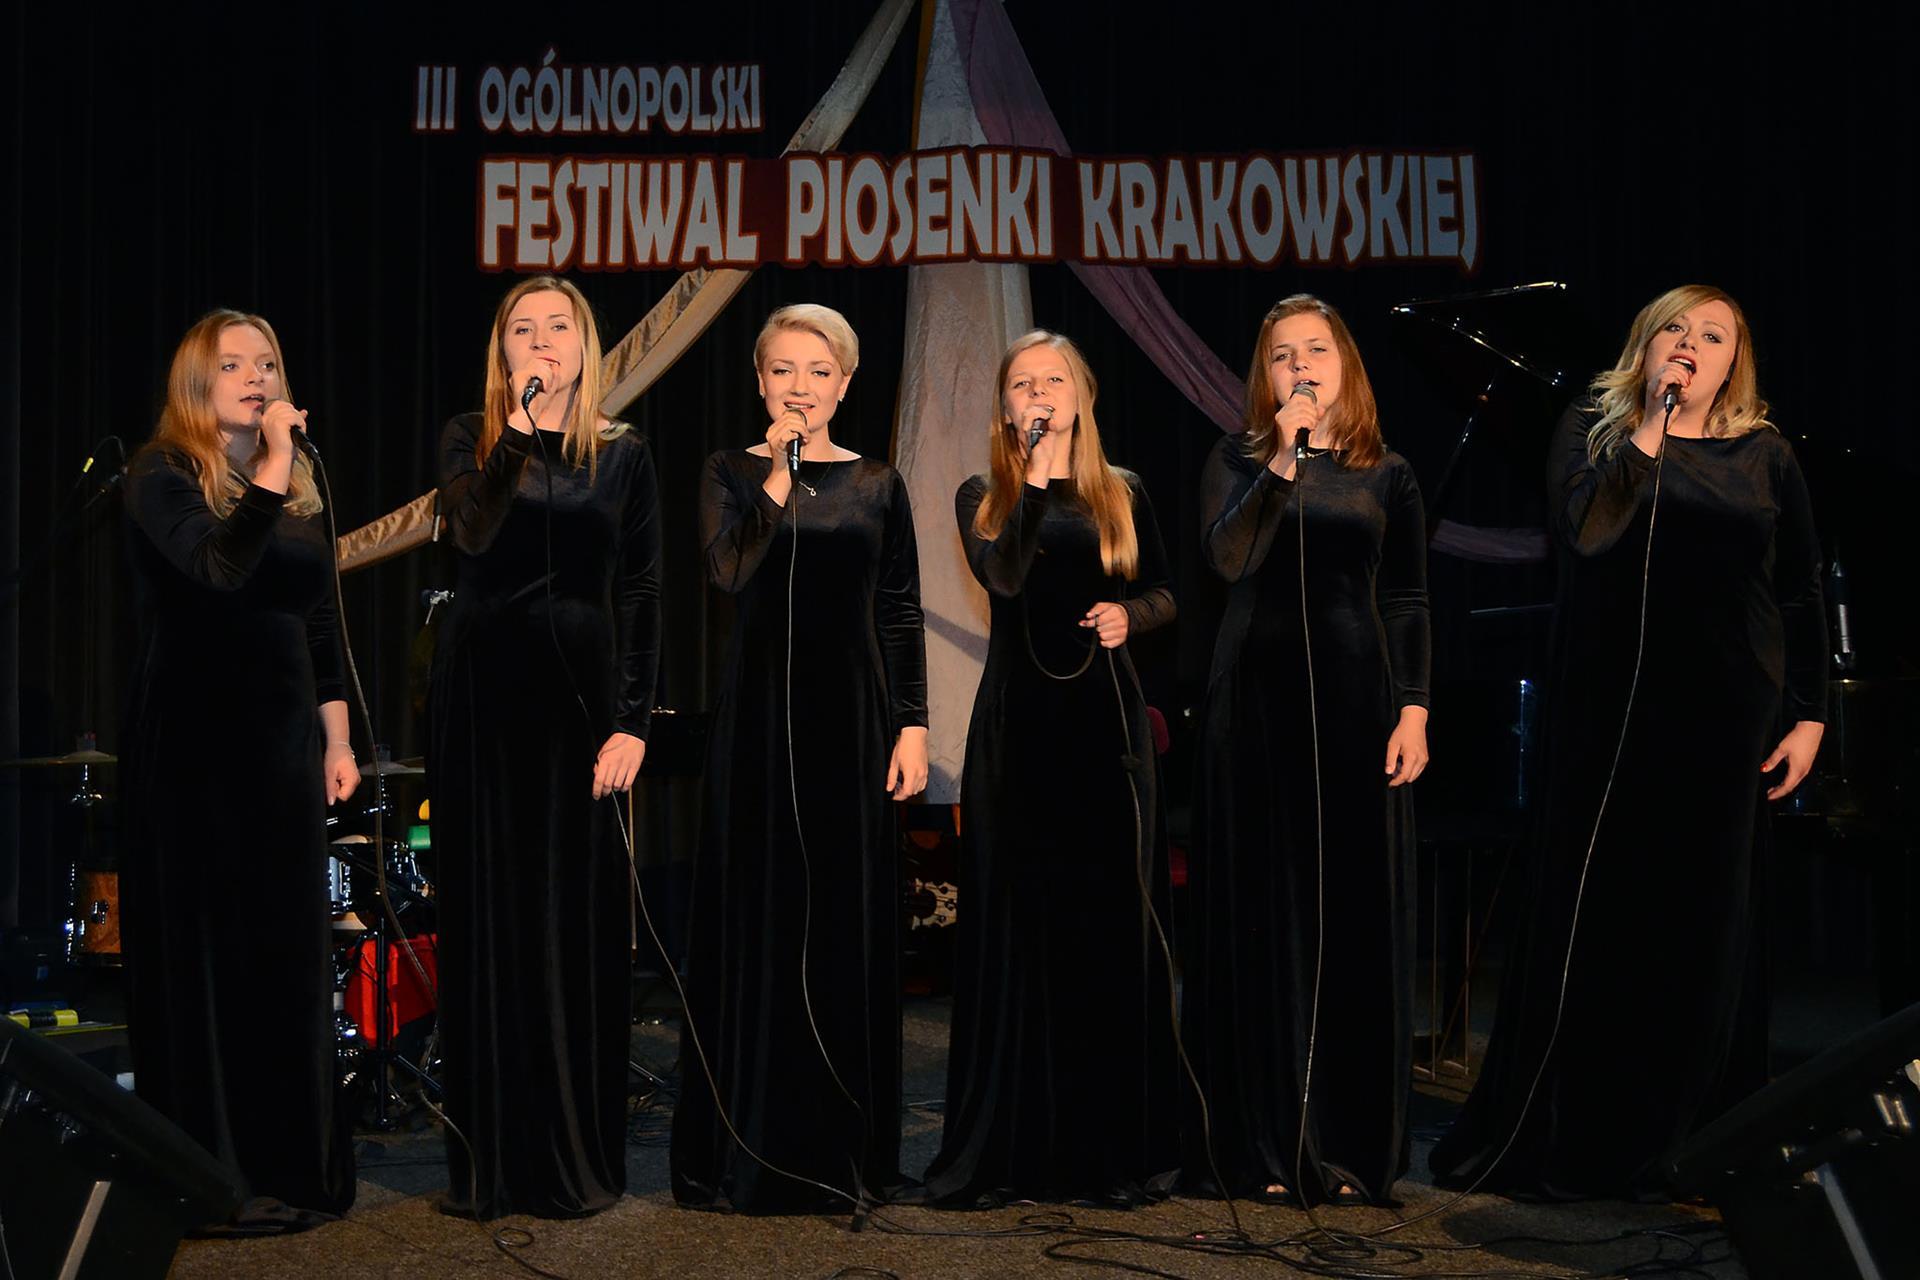 Laureaci Festiwalu, zespół Verso.